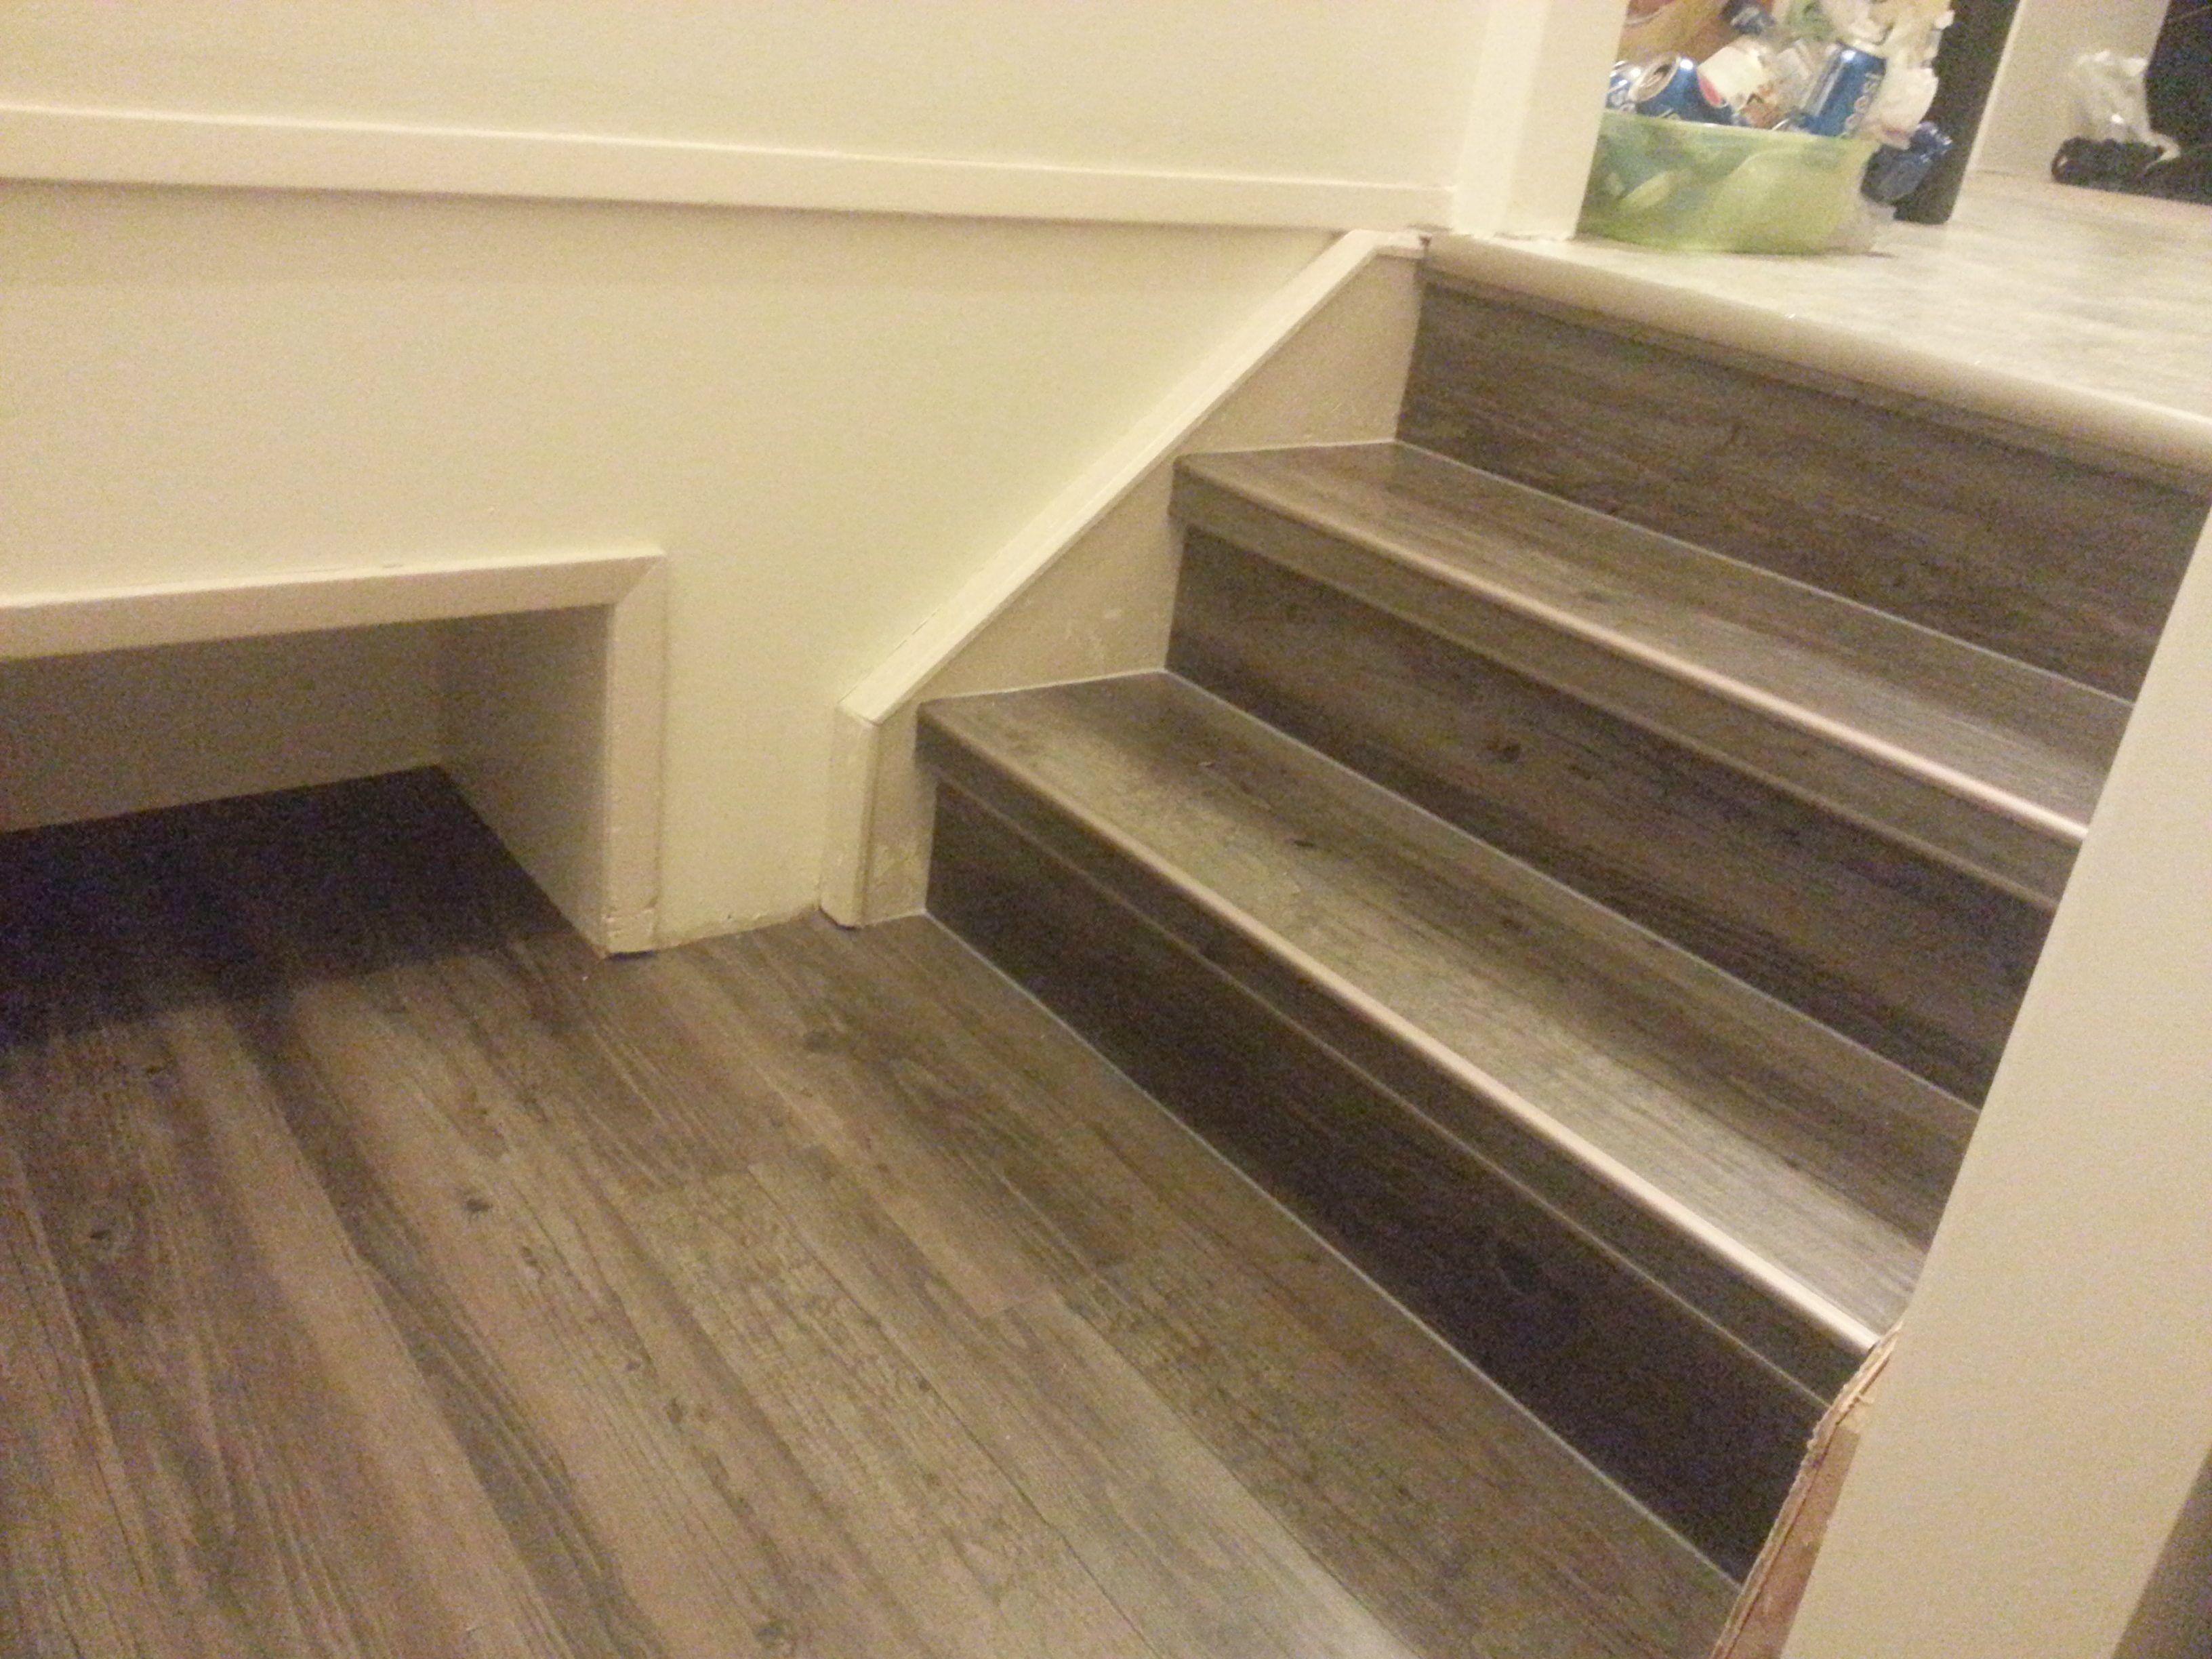 Image Result For Vinyl Plank Flooring On Stair Stringers Laminate Stairs Tile Stair Nosing Vinyl Plank Flooring